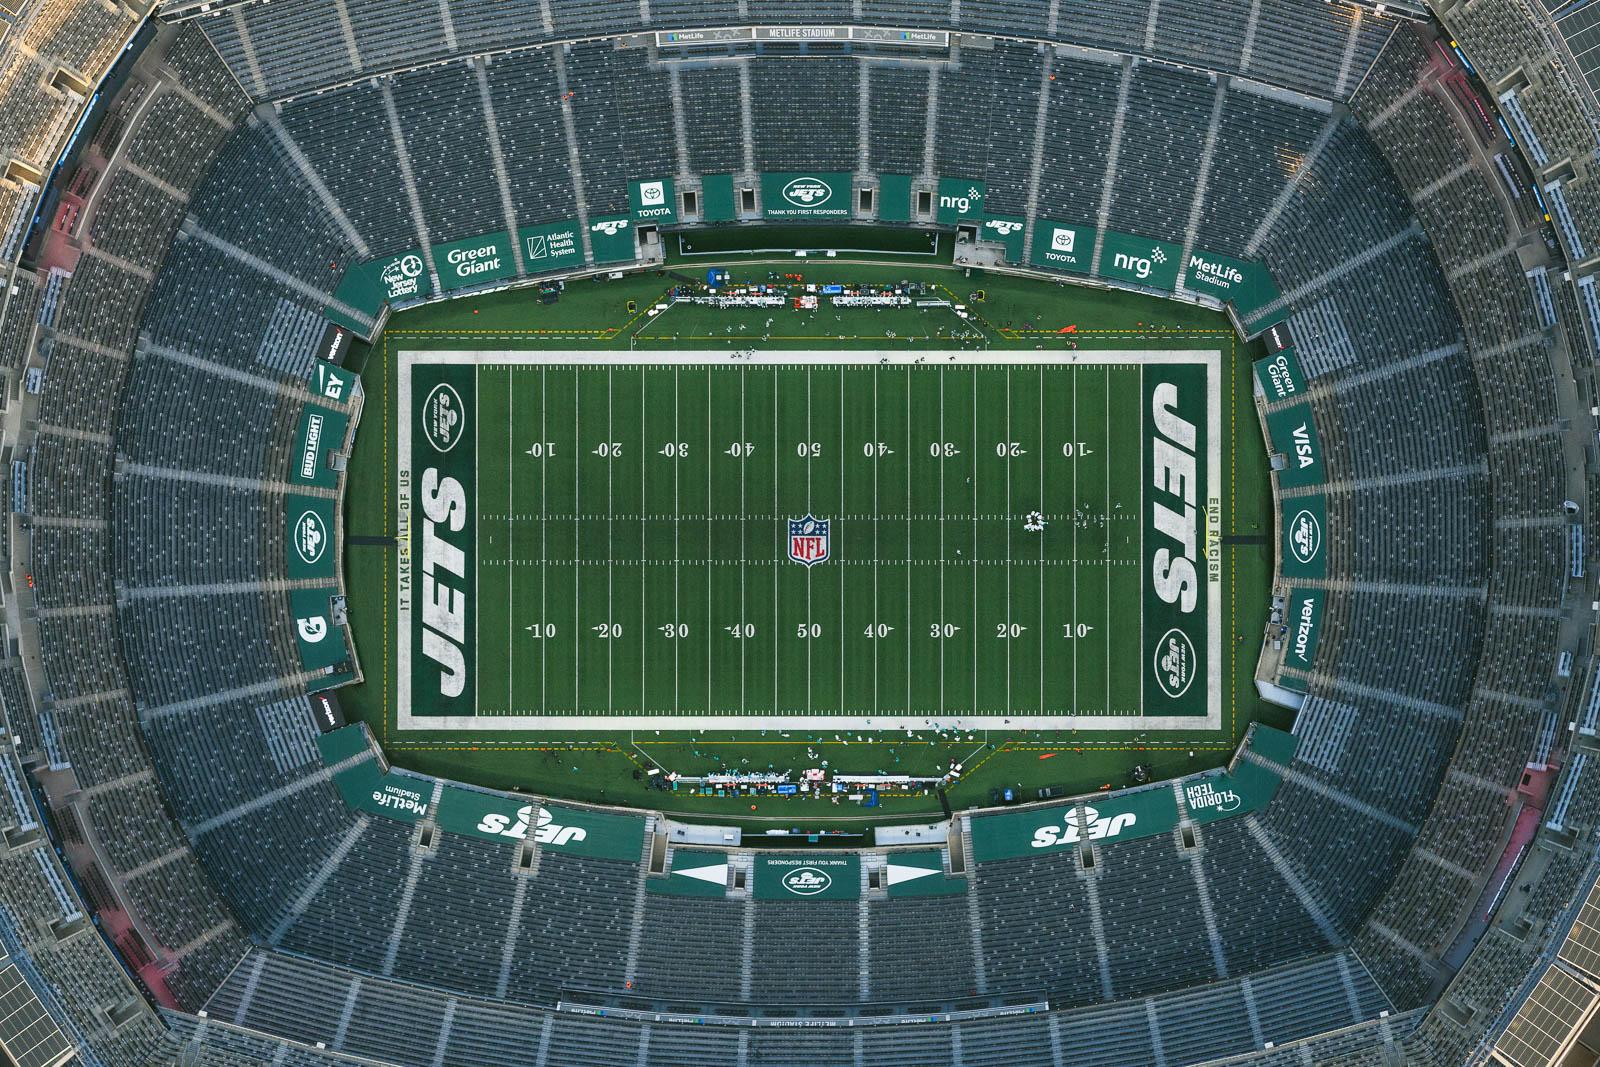 NY Jets plays Miami Dolphins at the empty MetLife Stadium (Nov 11, 2020)